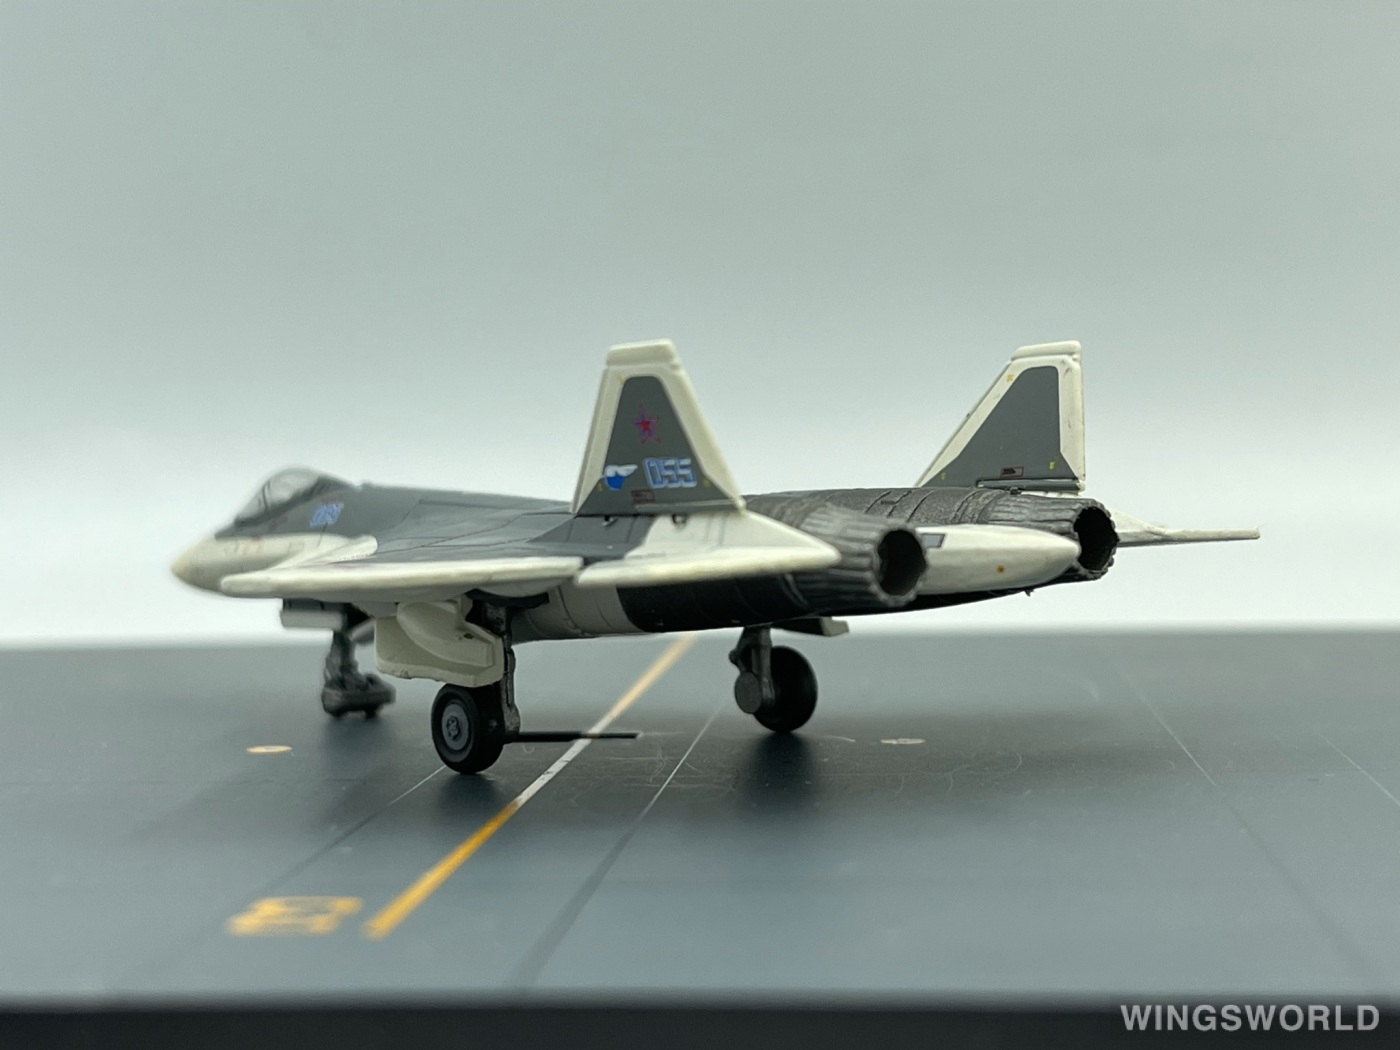 Herpa 1:200 559751 Sukhoi Aircraft Corporation 苏霍伊飞机公司 Sukhoi Su-57 055